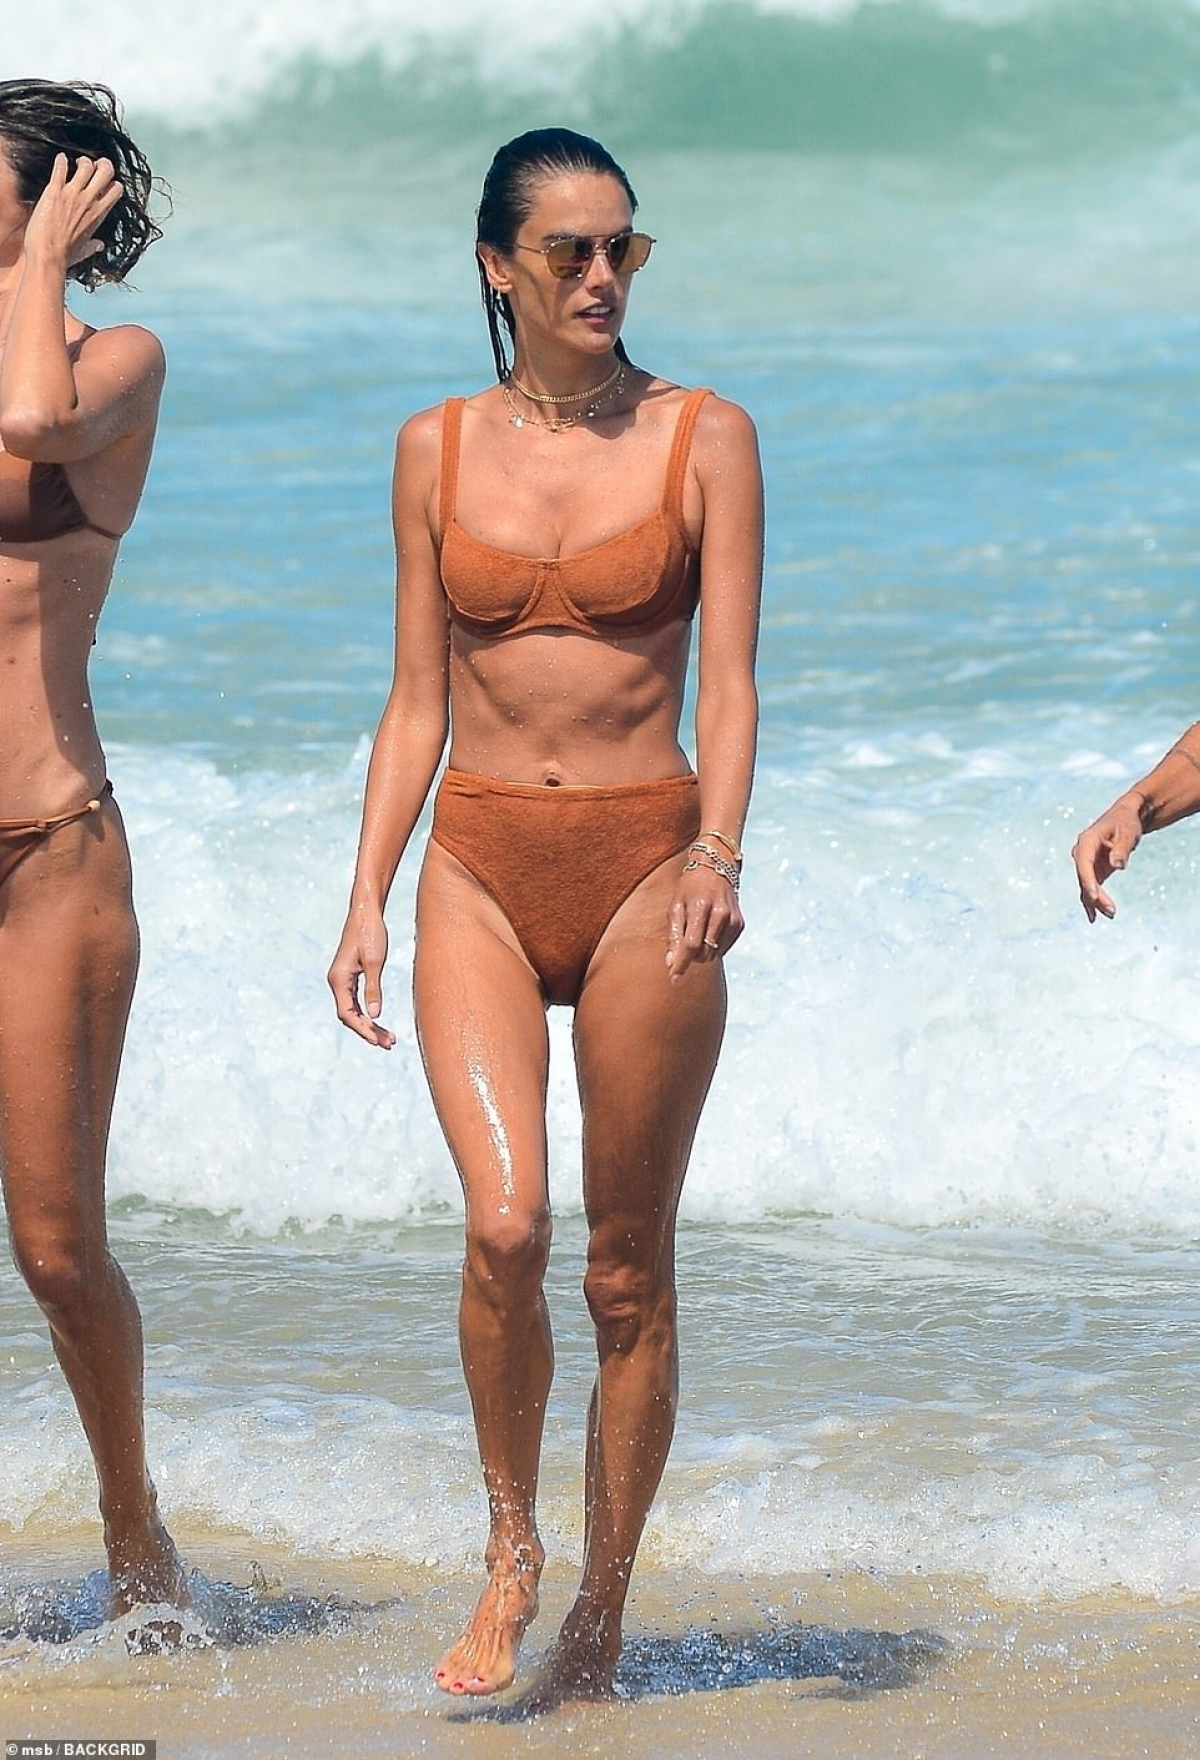 Alessandra Ambrosio đi chơi biển ở quê nhà Florianopolis (Brazil) vừa qua.